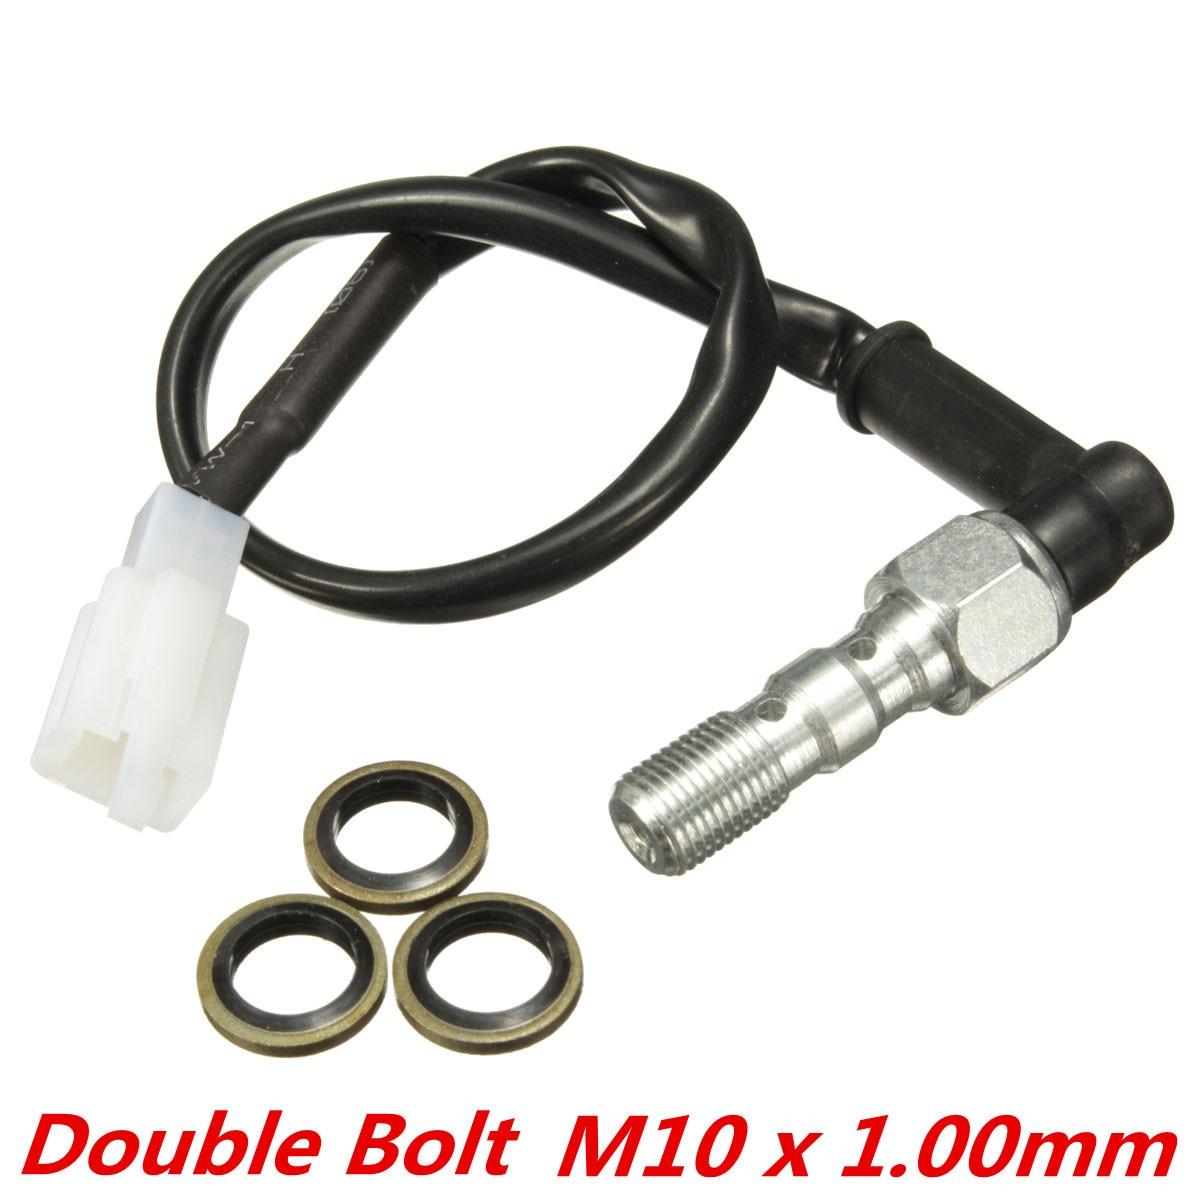 M10 x 1.00mm Motorcycle Hydraulic Double Banjo Bolt Brake Pressure Light Switch For Honda /Kawasaki /Suzuki /Yamaha 2x motorcycle brake banjo bolt m10x1 00 for brake master cylinders calipers